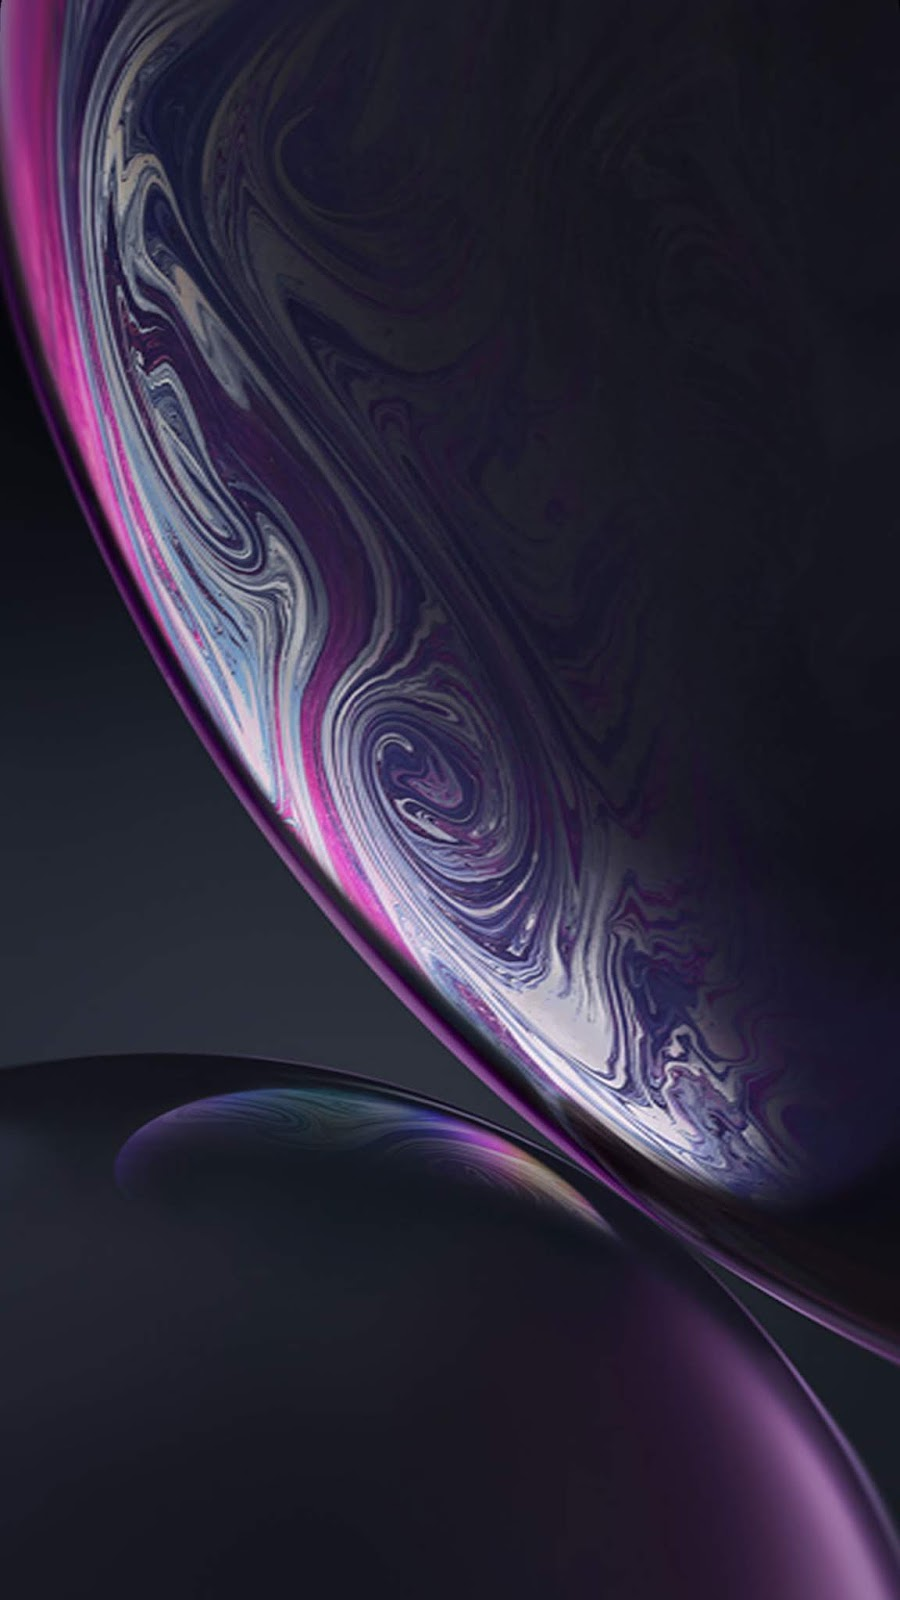 Best Iphone X Wallpaper Notch Best Iphone Xs Optimized Full Hd Plus Wallpaper Free